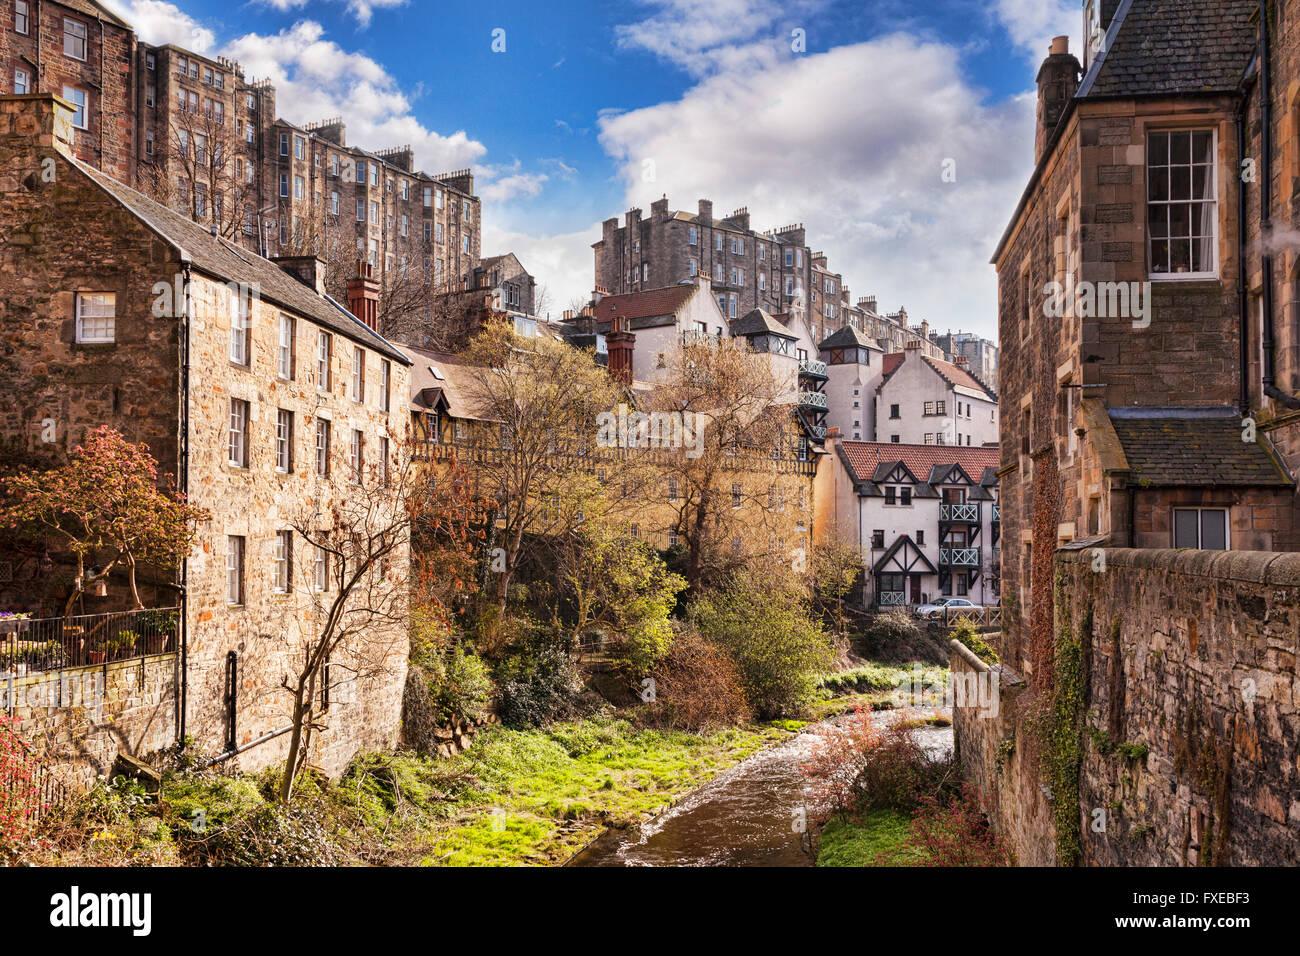 Casas y apartamentos con vistas al Agua de Leith, Edimburgo, Escocia, Reino Unido Imagen De Stock